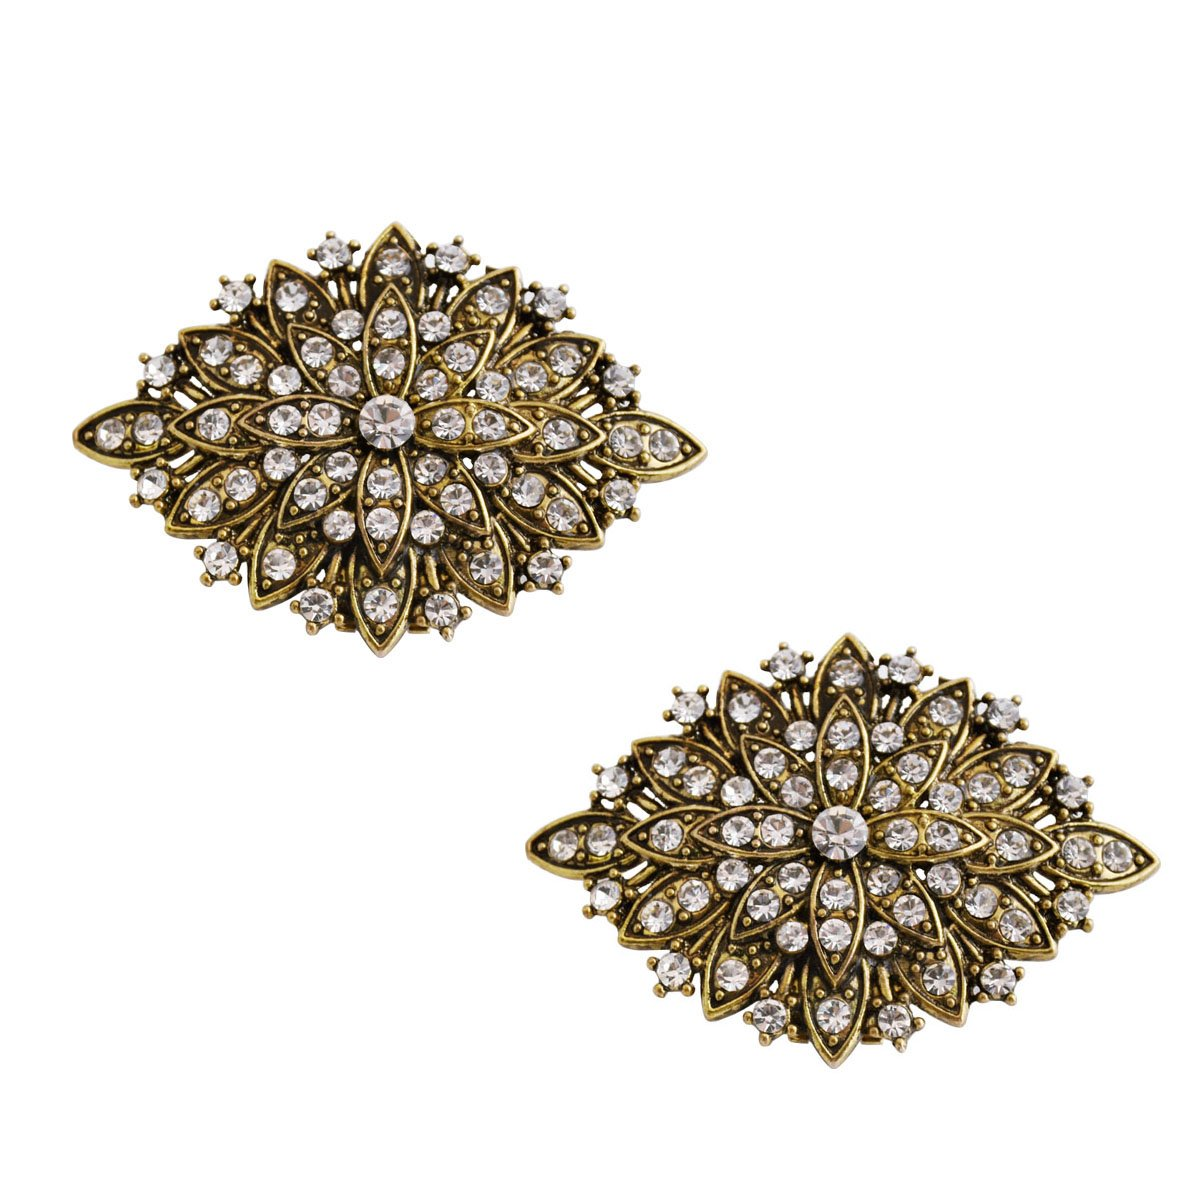 ElegantPark CG Antique Gold Leaf Design Rhinestones Wedding Party Decoration Shoe Clips Silver 2 Pcs